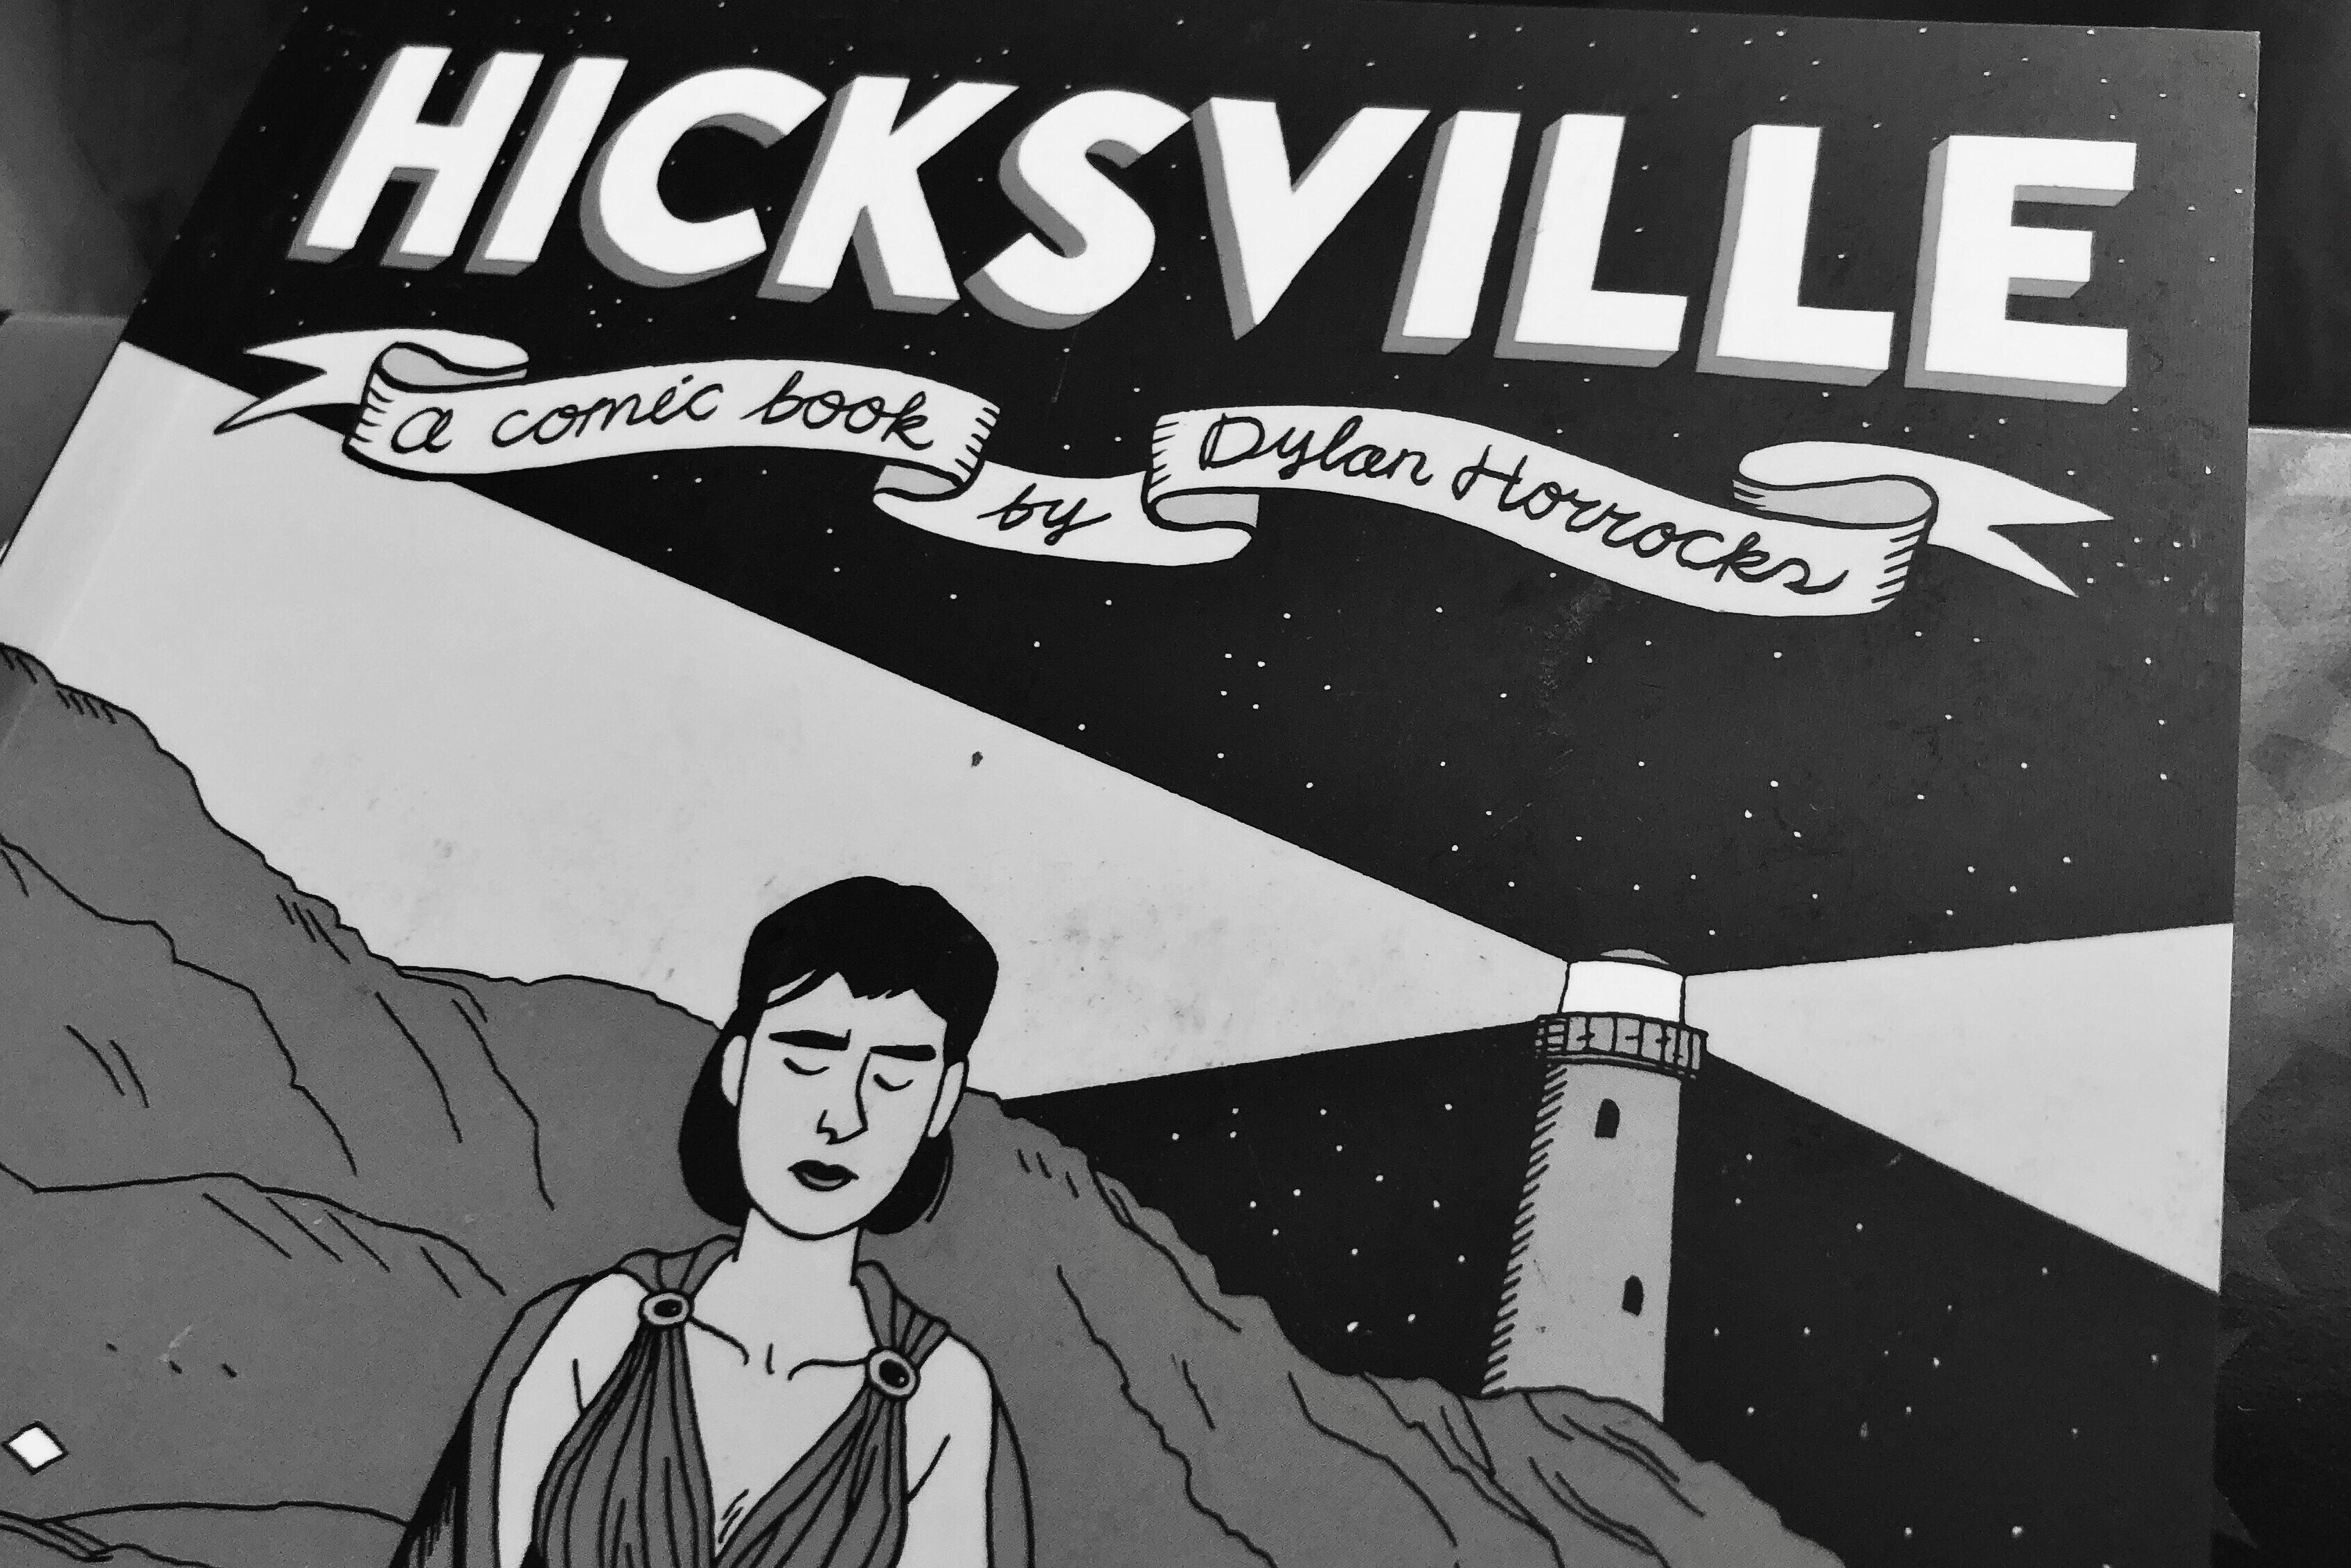 hicksville-cover